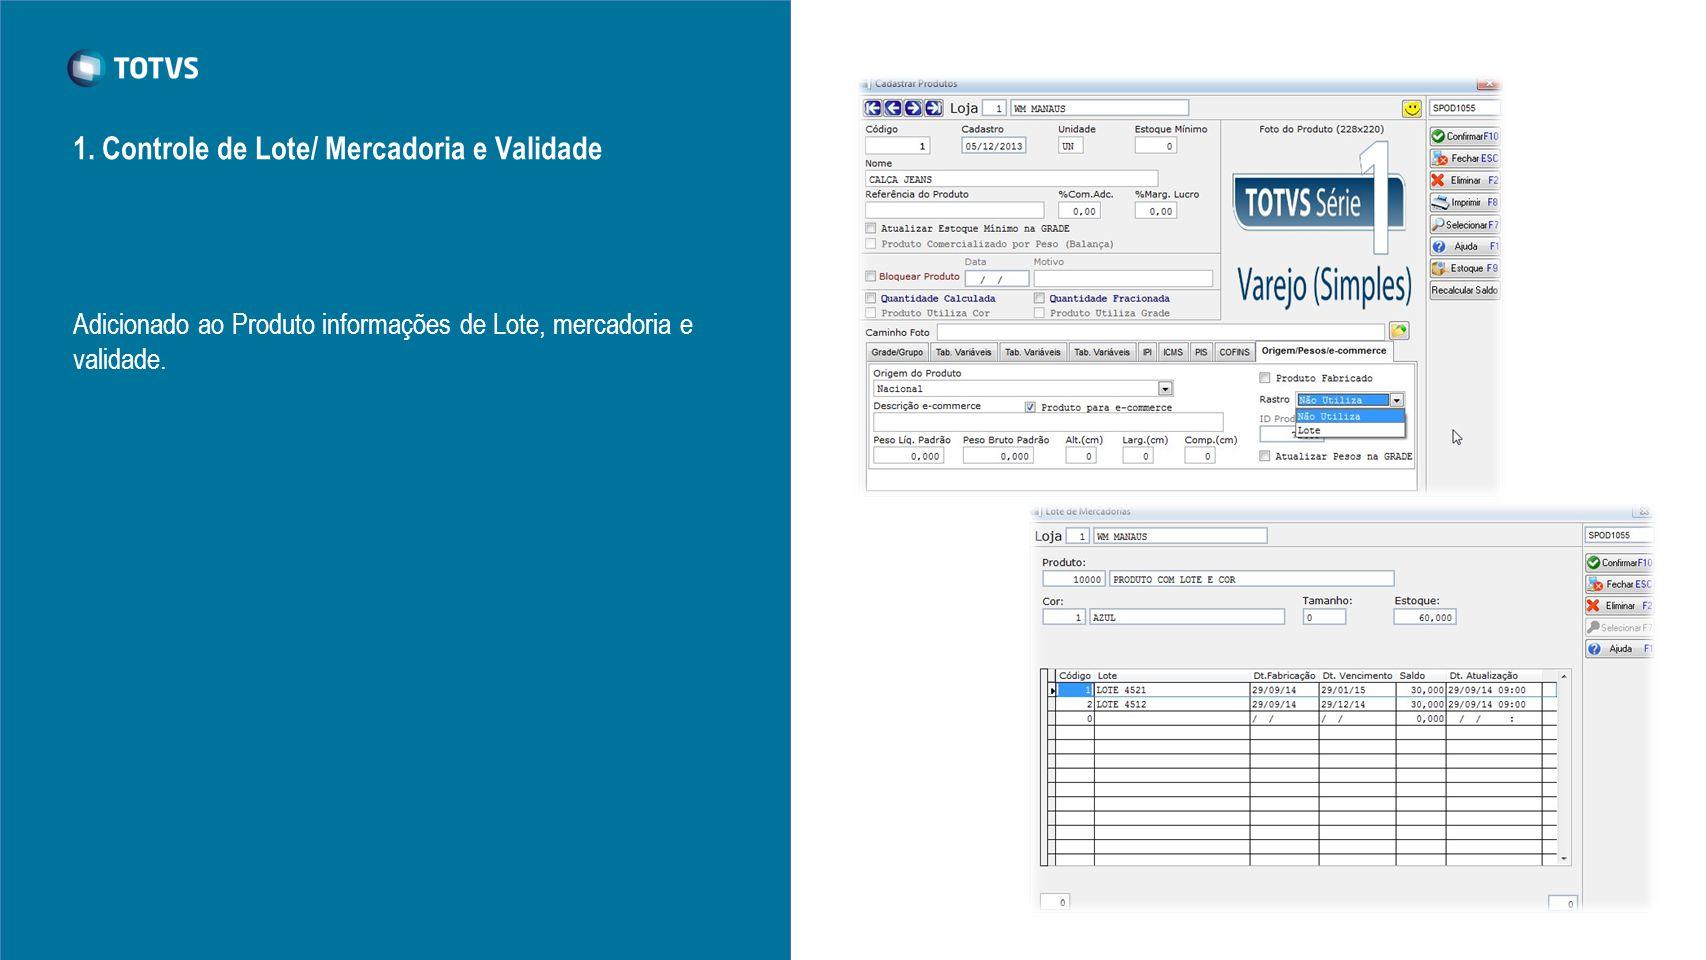 1. Controle de Lote/ Mercadoria e Validade Adicionado ao Produto informações de Lote, mercadoria e validade.